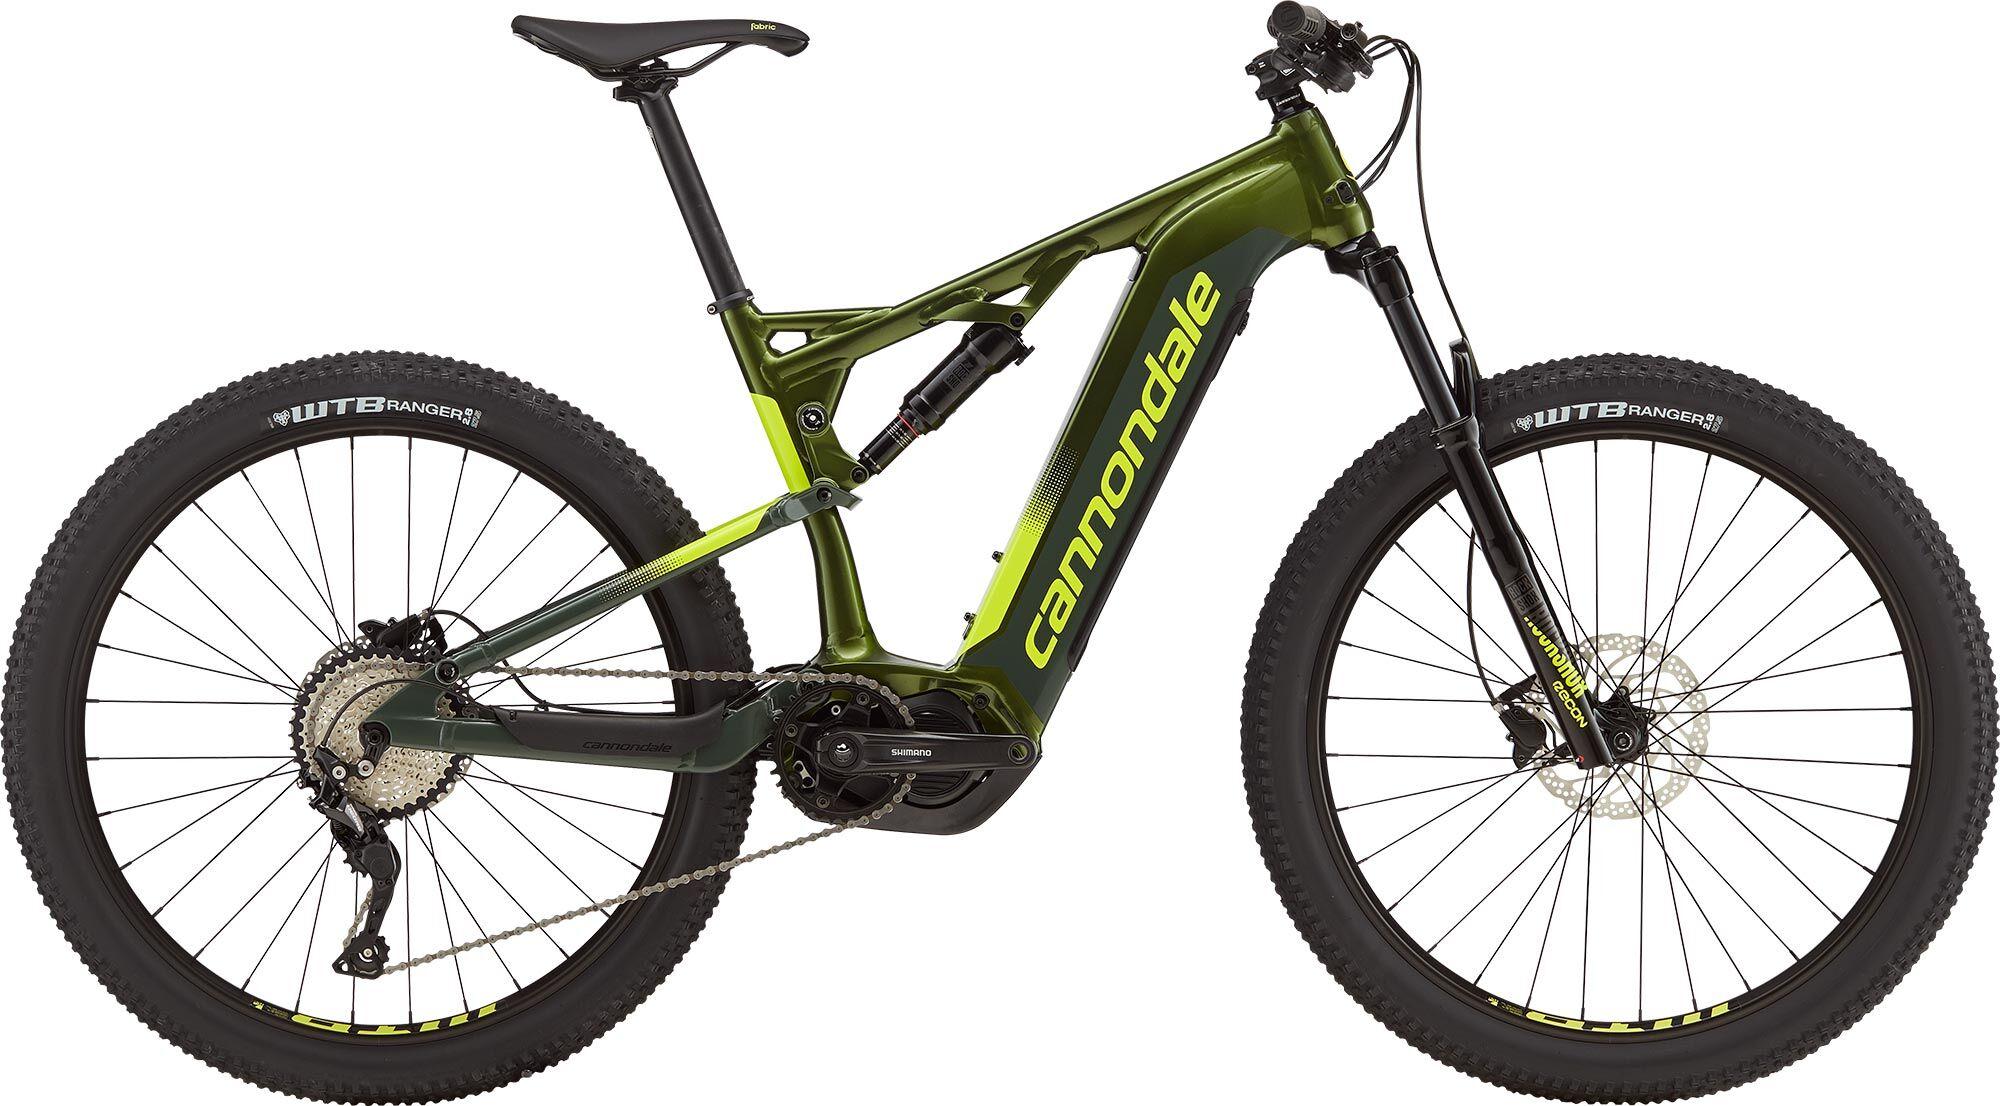 Cannondale e-Mountainbike Cujo Neo 4 2019 - gelb grün